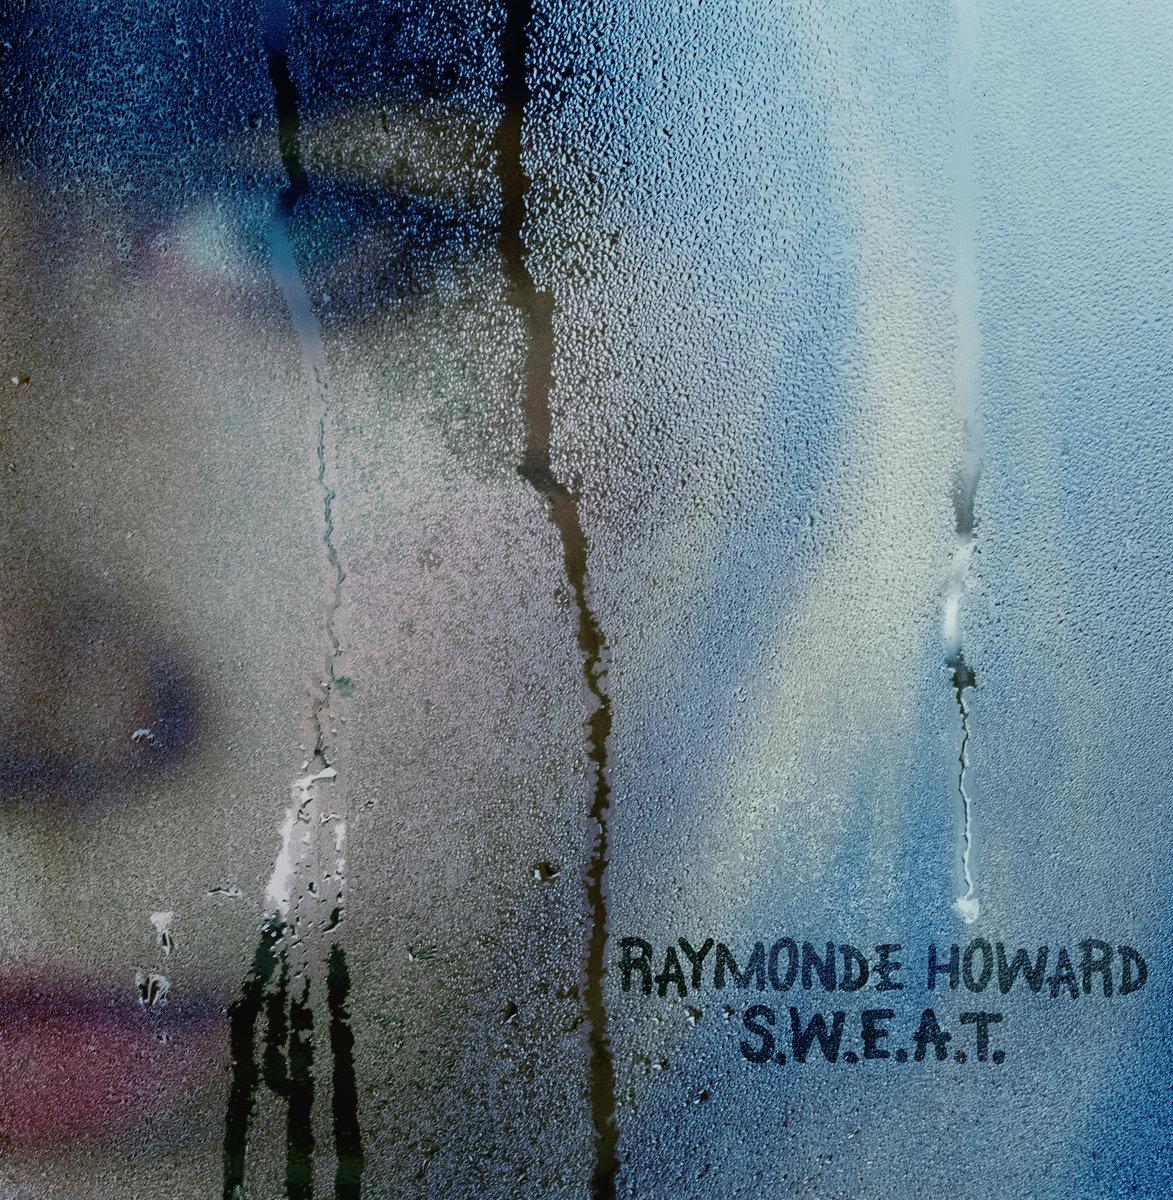 RAYMONDE HOWARD - S.W.E.A.T